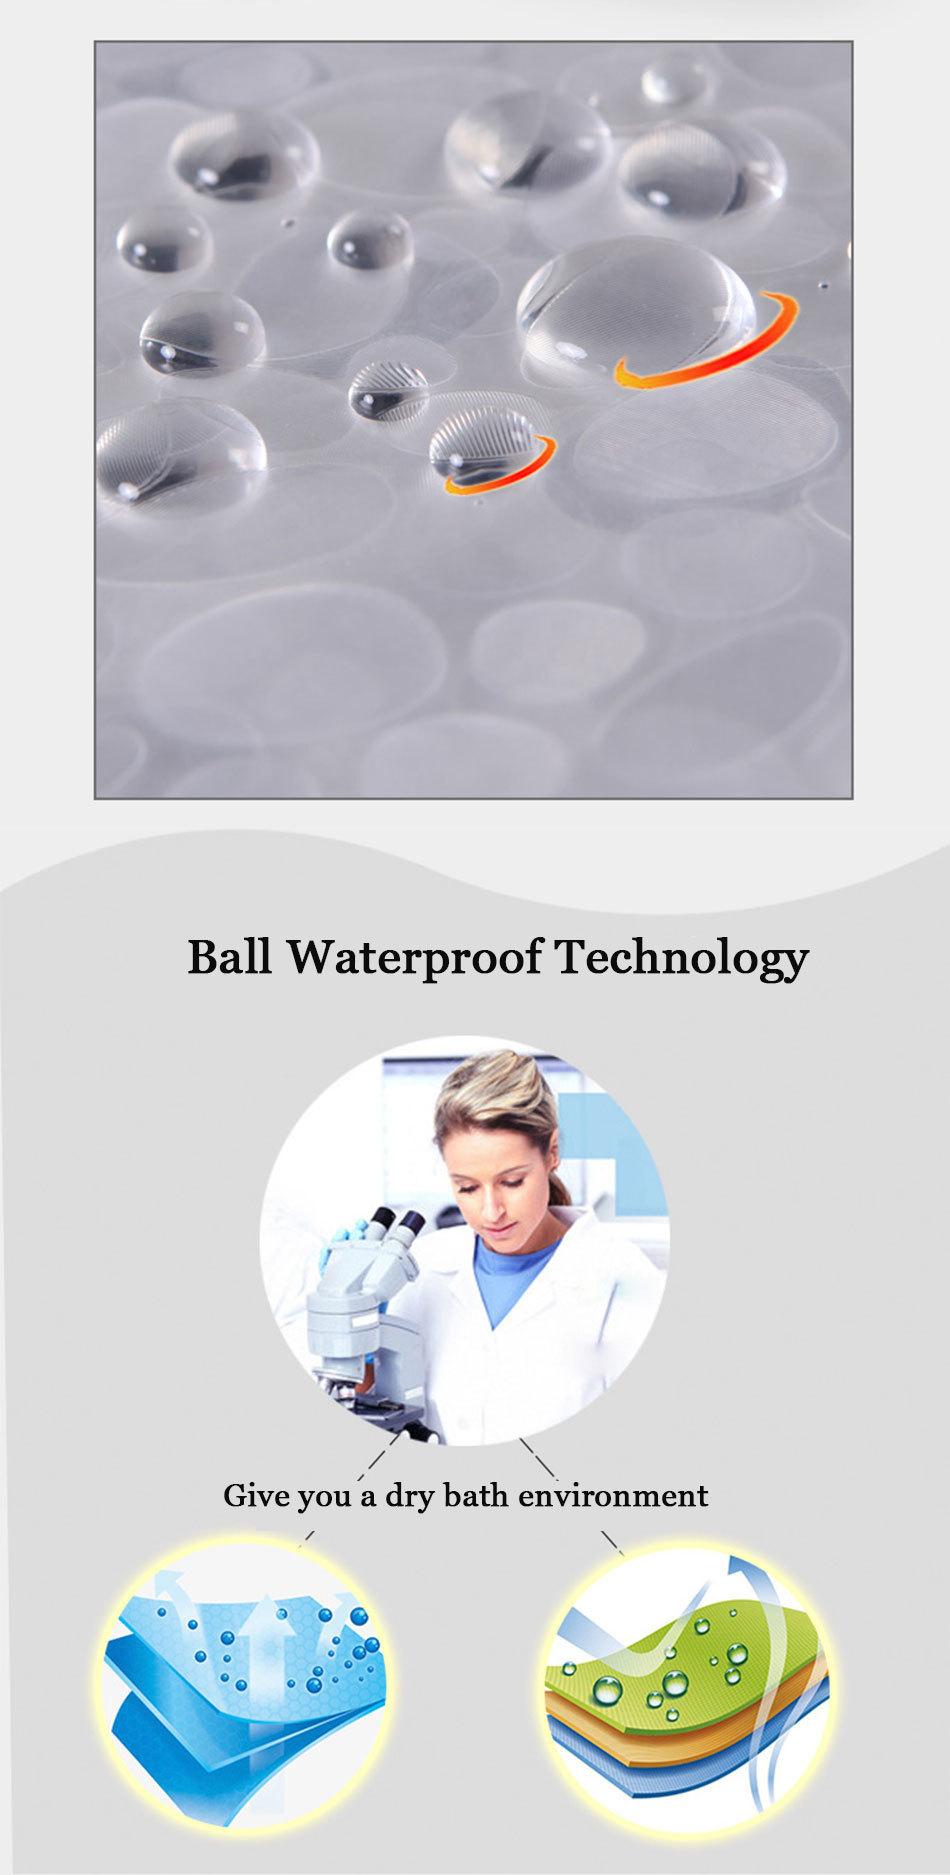 High Quality waterproof bathroom accessories